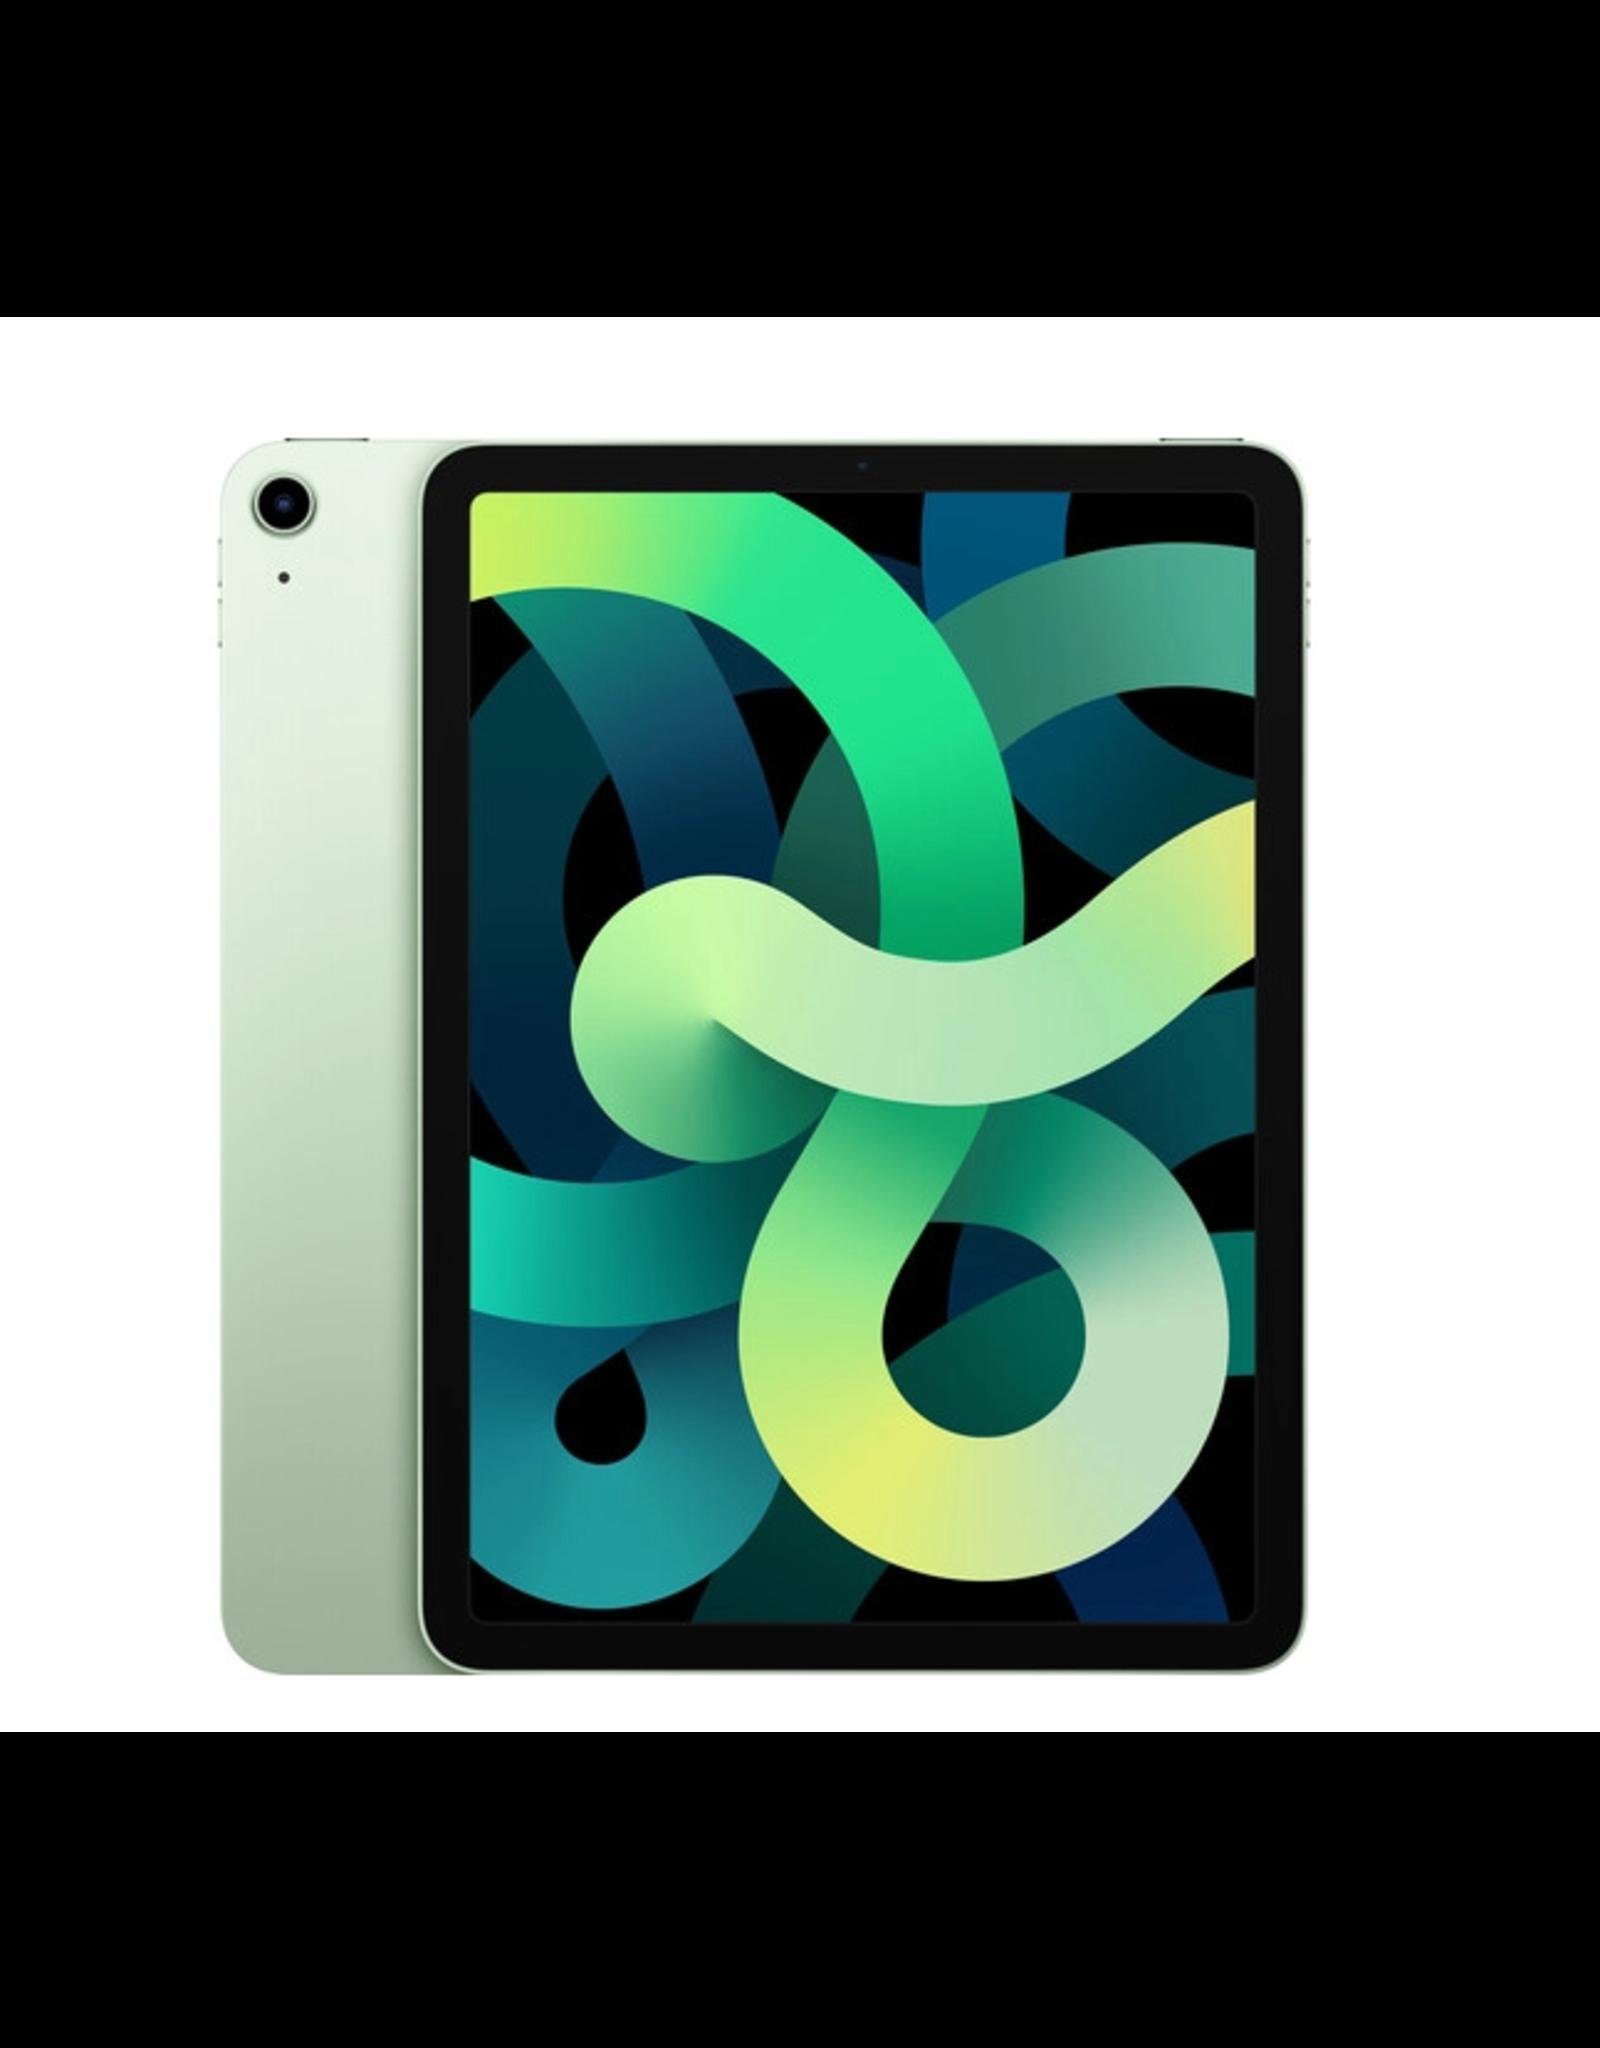 APPLE IPAD AIR 10.9-INCH WI-FI 64GB GREEN